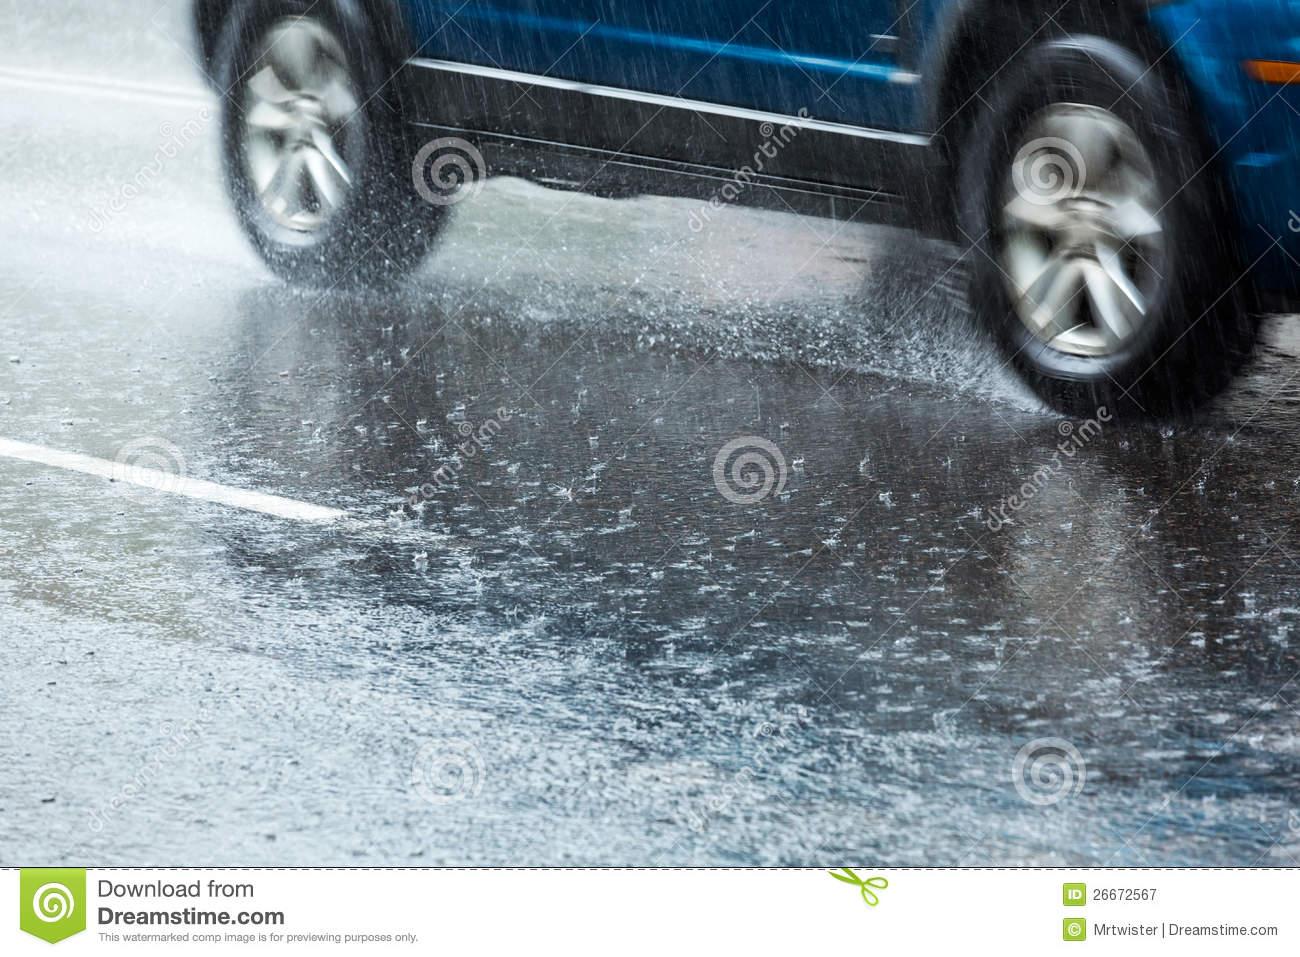 Wet car clipart.